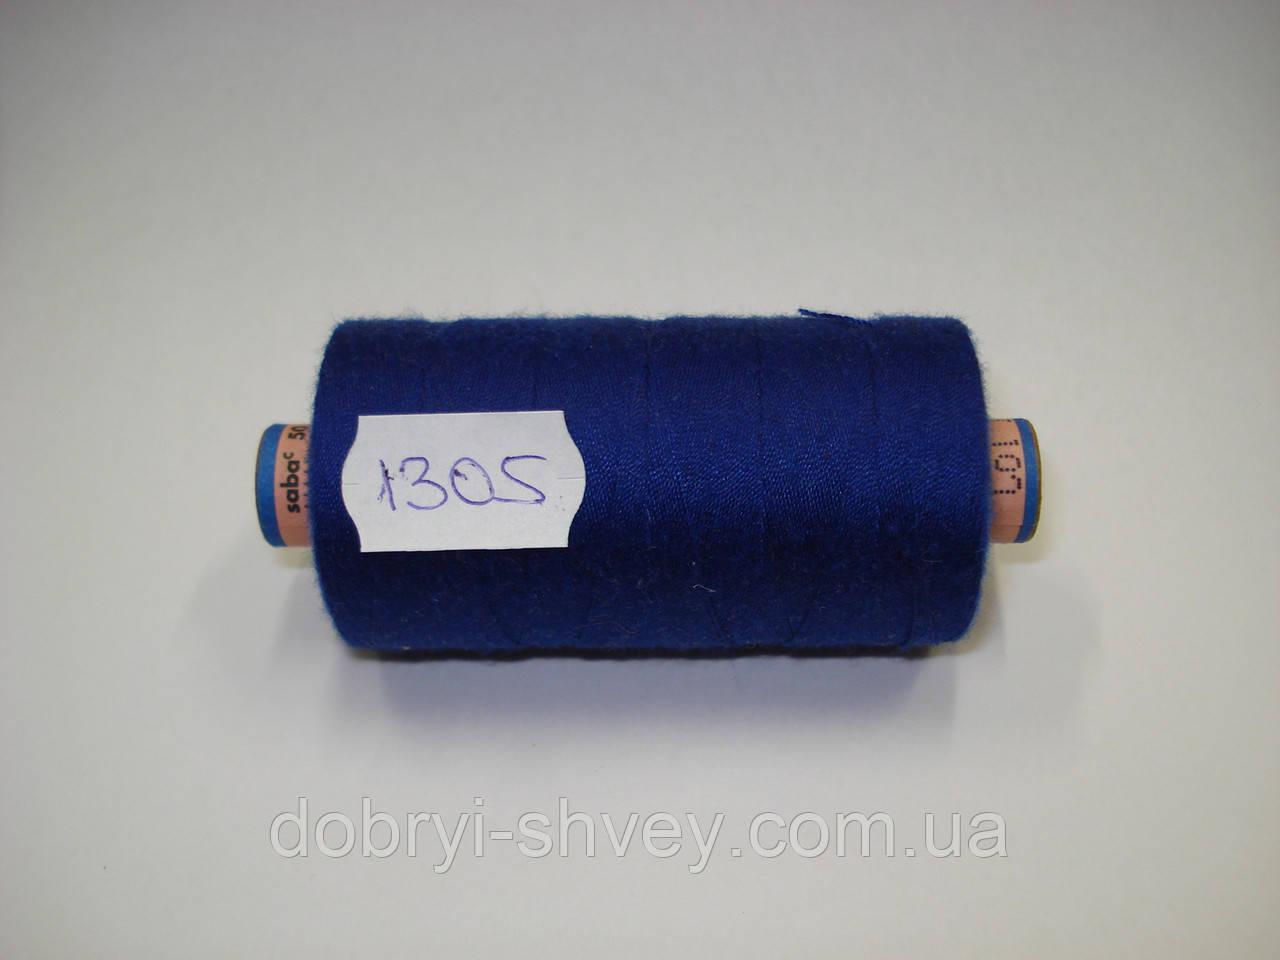 Нитка AMANN Saba c №50 500м.col 1305 электрик (шт.)